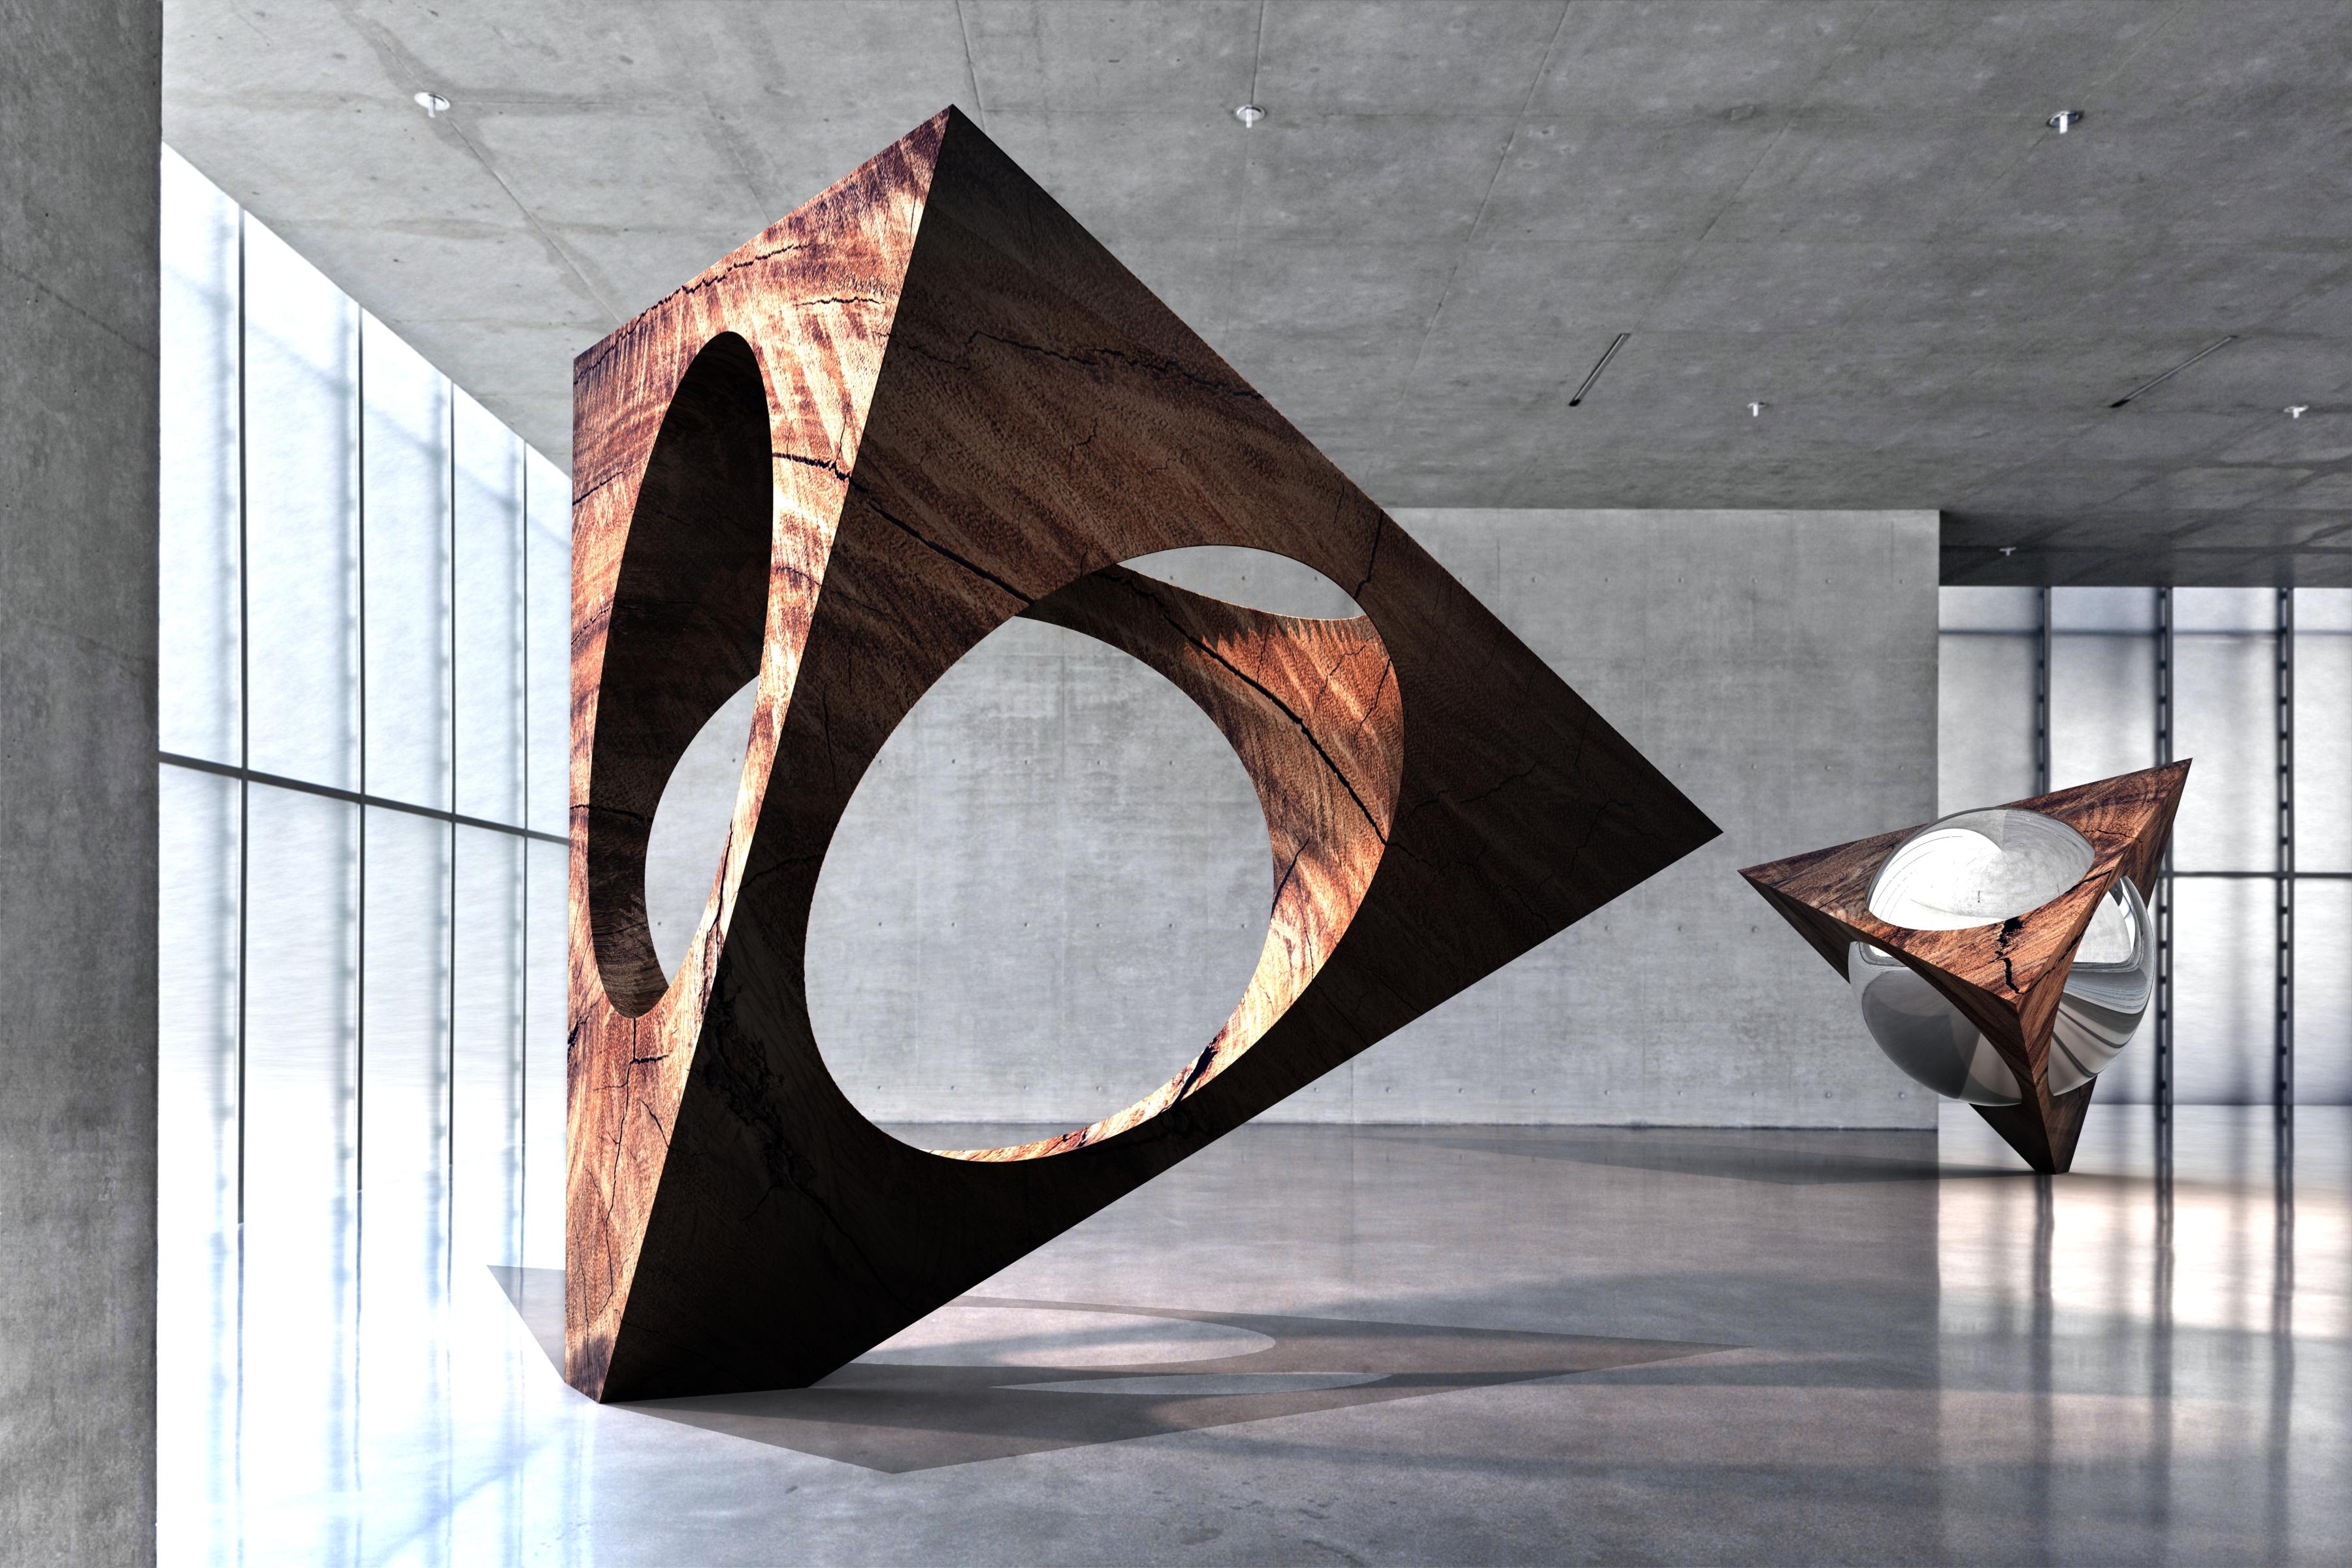 Contemporary Sculpture KUB Architecture Kunsthaus Bregenz Tetrasphere